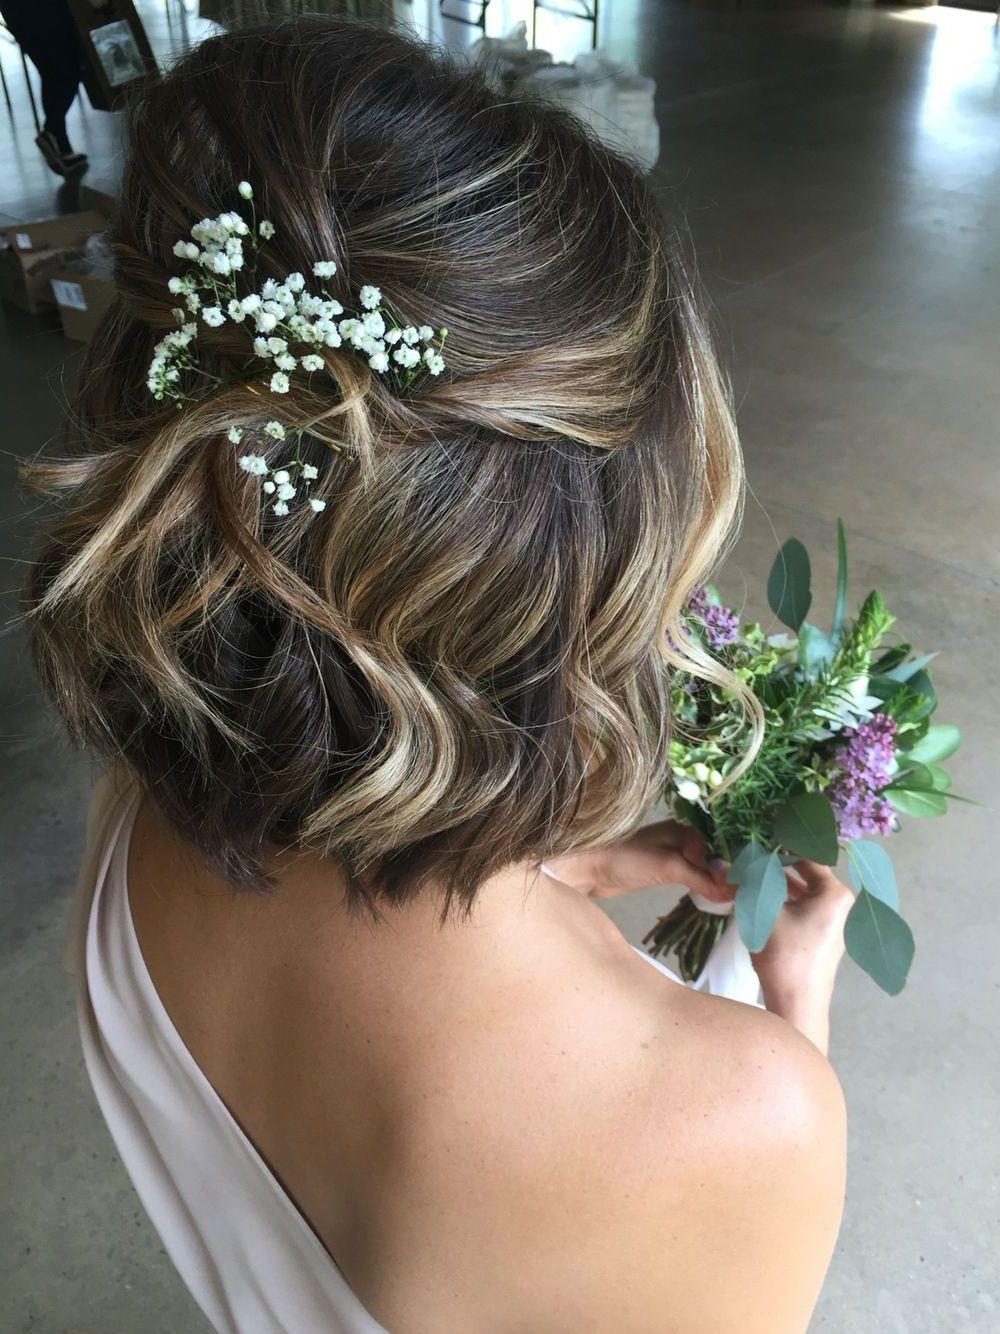 Bridesmaid Hairstyles For Short Hair Best Hairstyles For Cabelo Curto Para Casamento Penteados Noiva Cabelo Curto Penteado Casamento